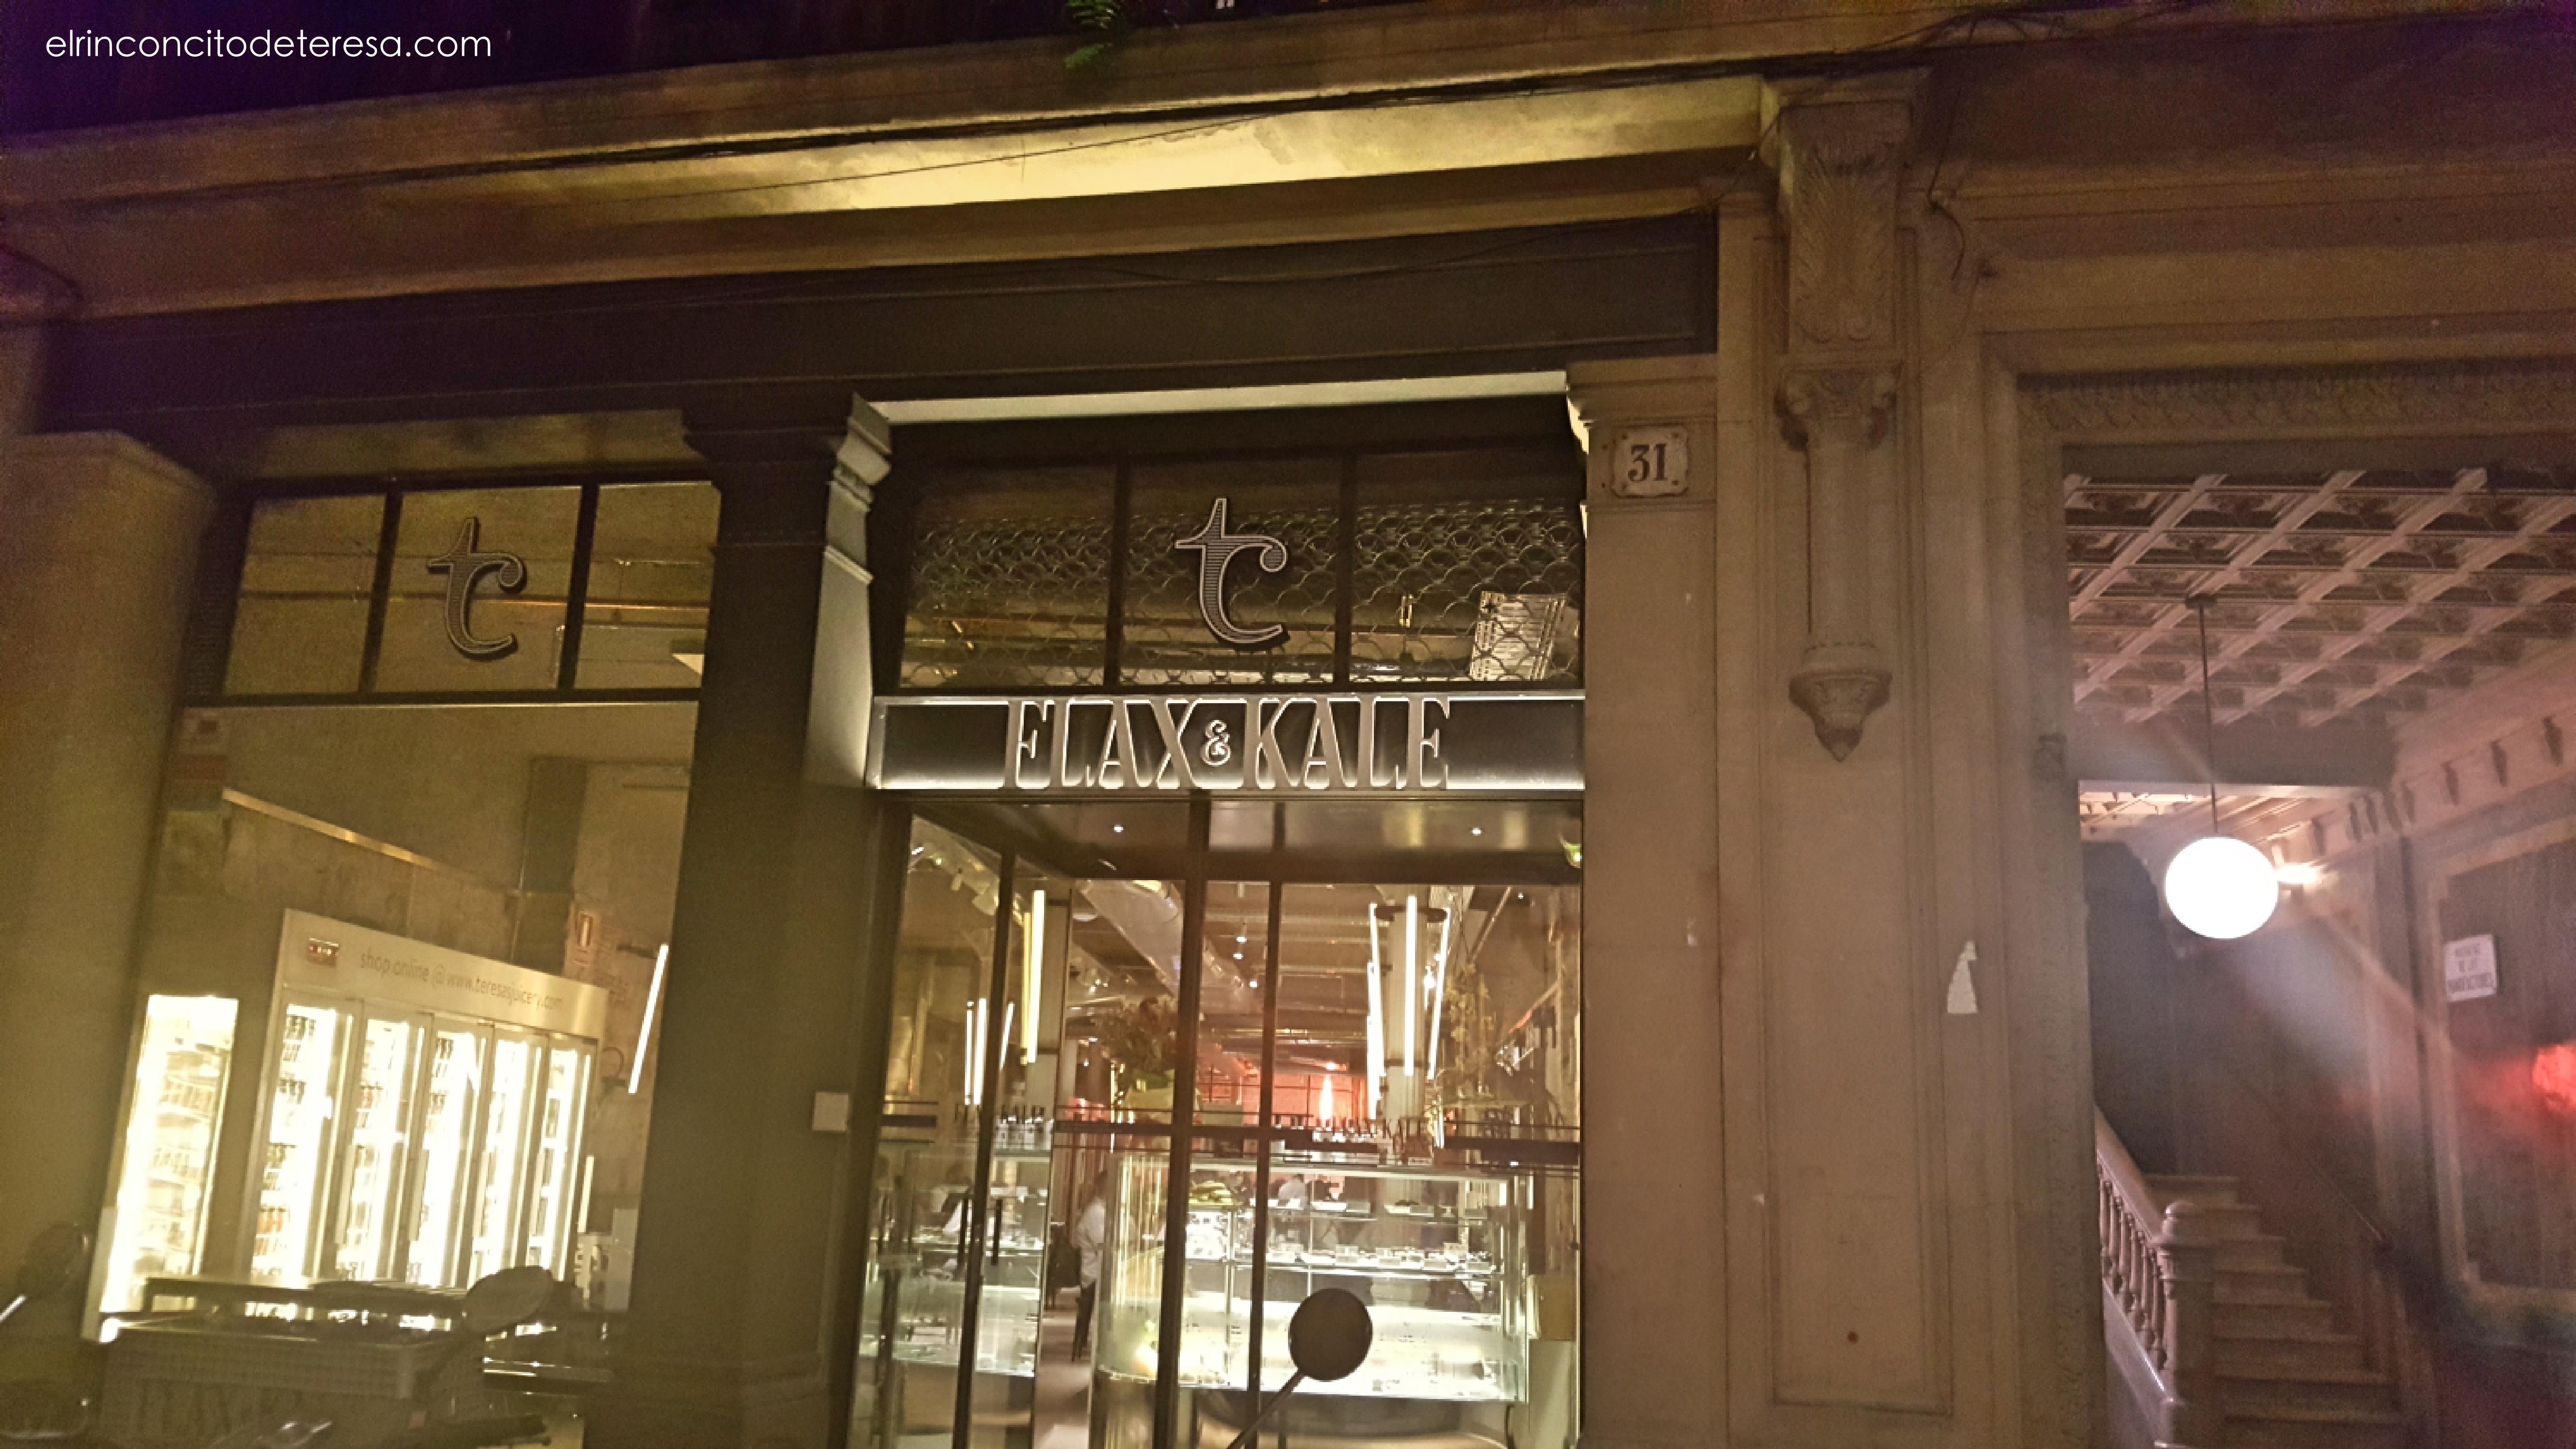 flax-kale-passage-entrada